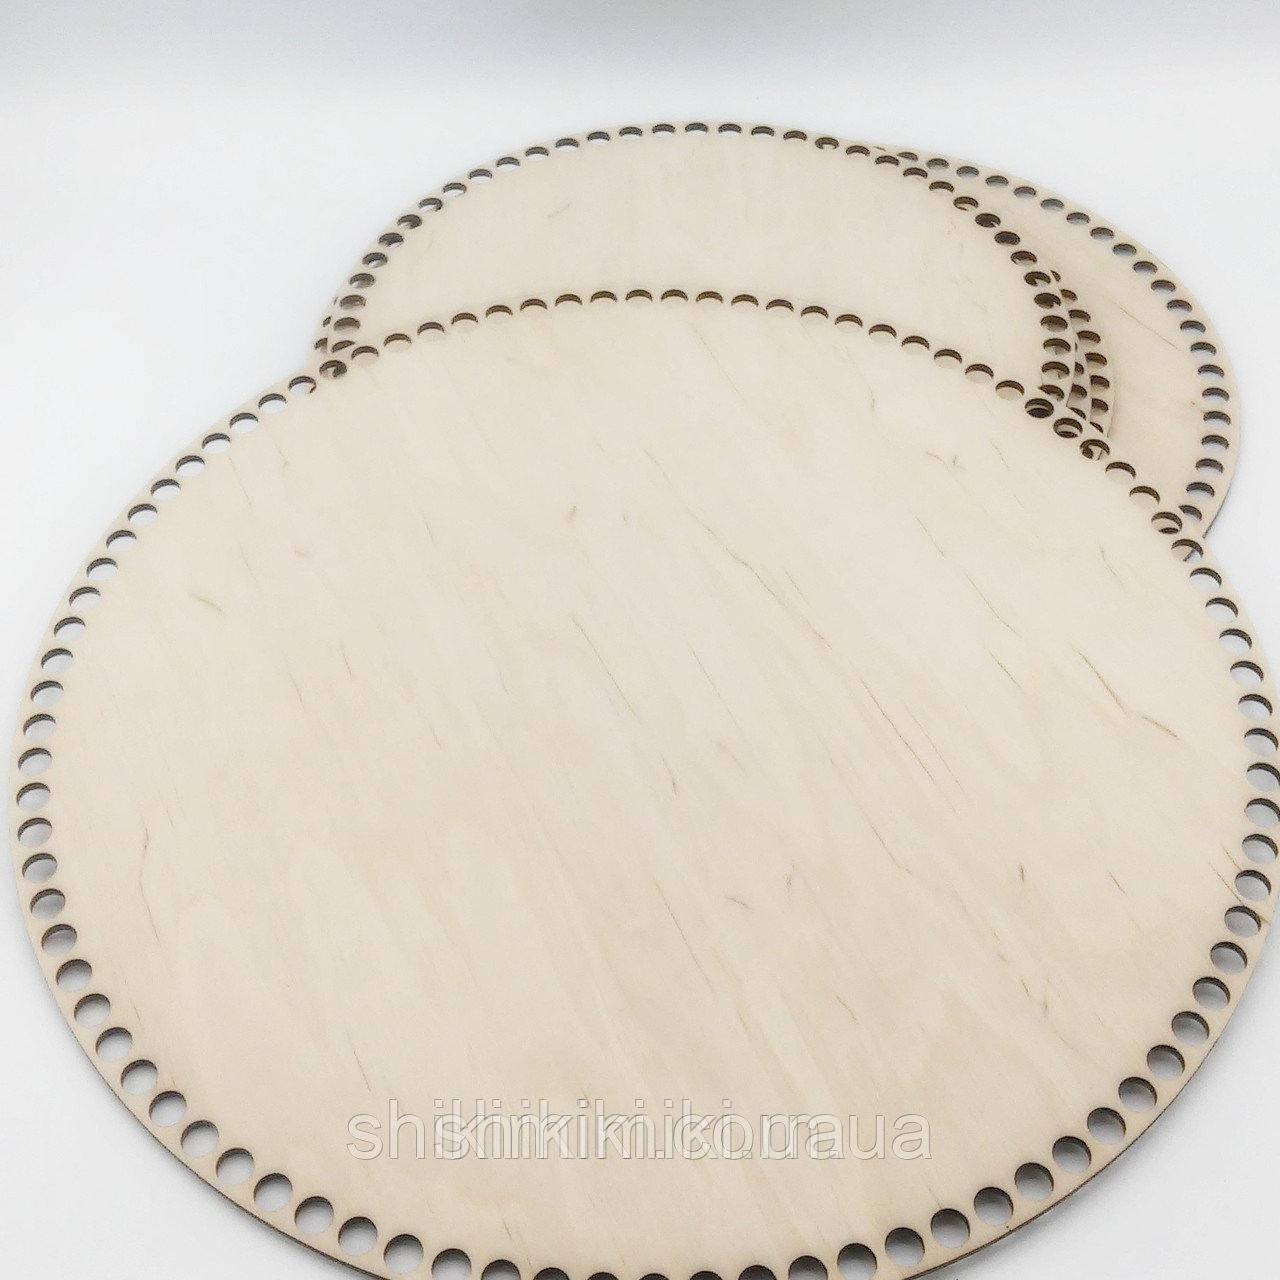 Денце з фанери кругле, базова (34 см)